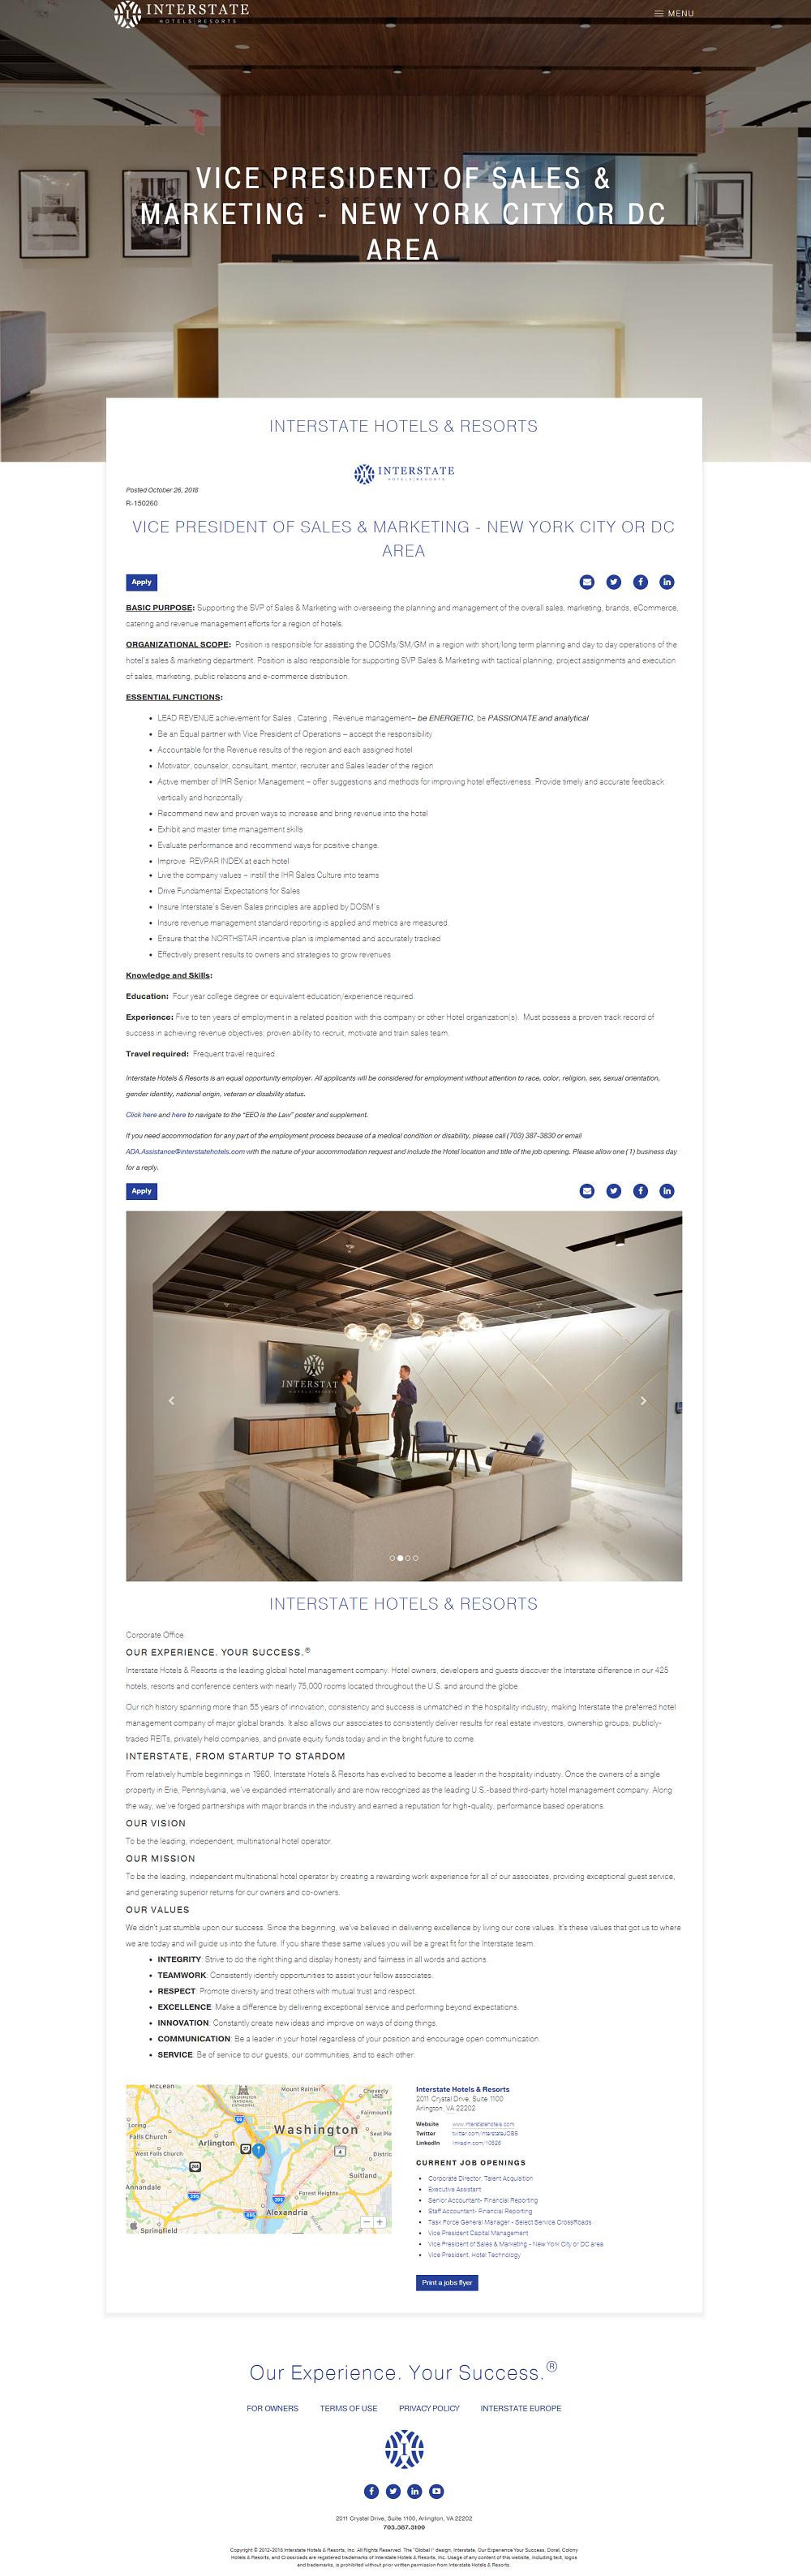 Interstate Hotels job description